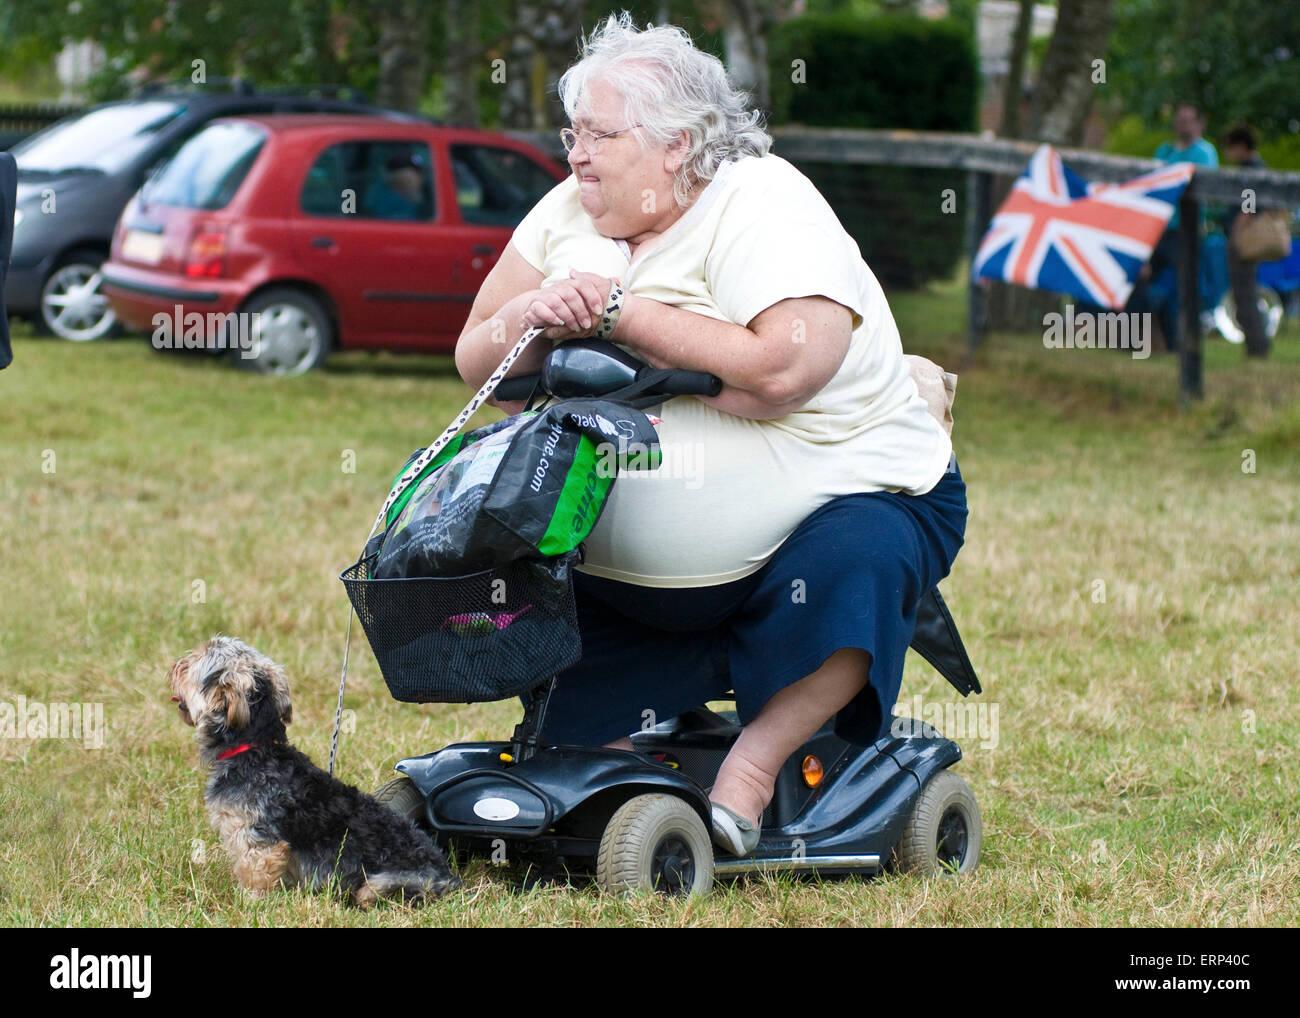 Walking Dog In Wheelchair